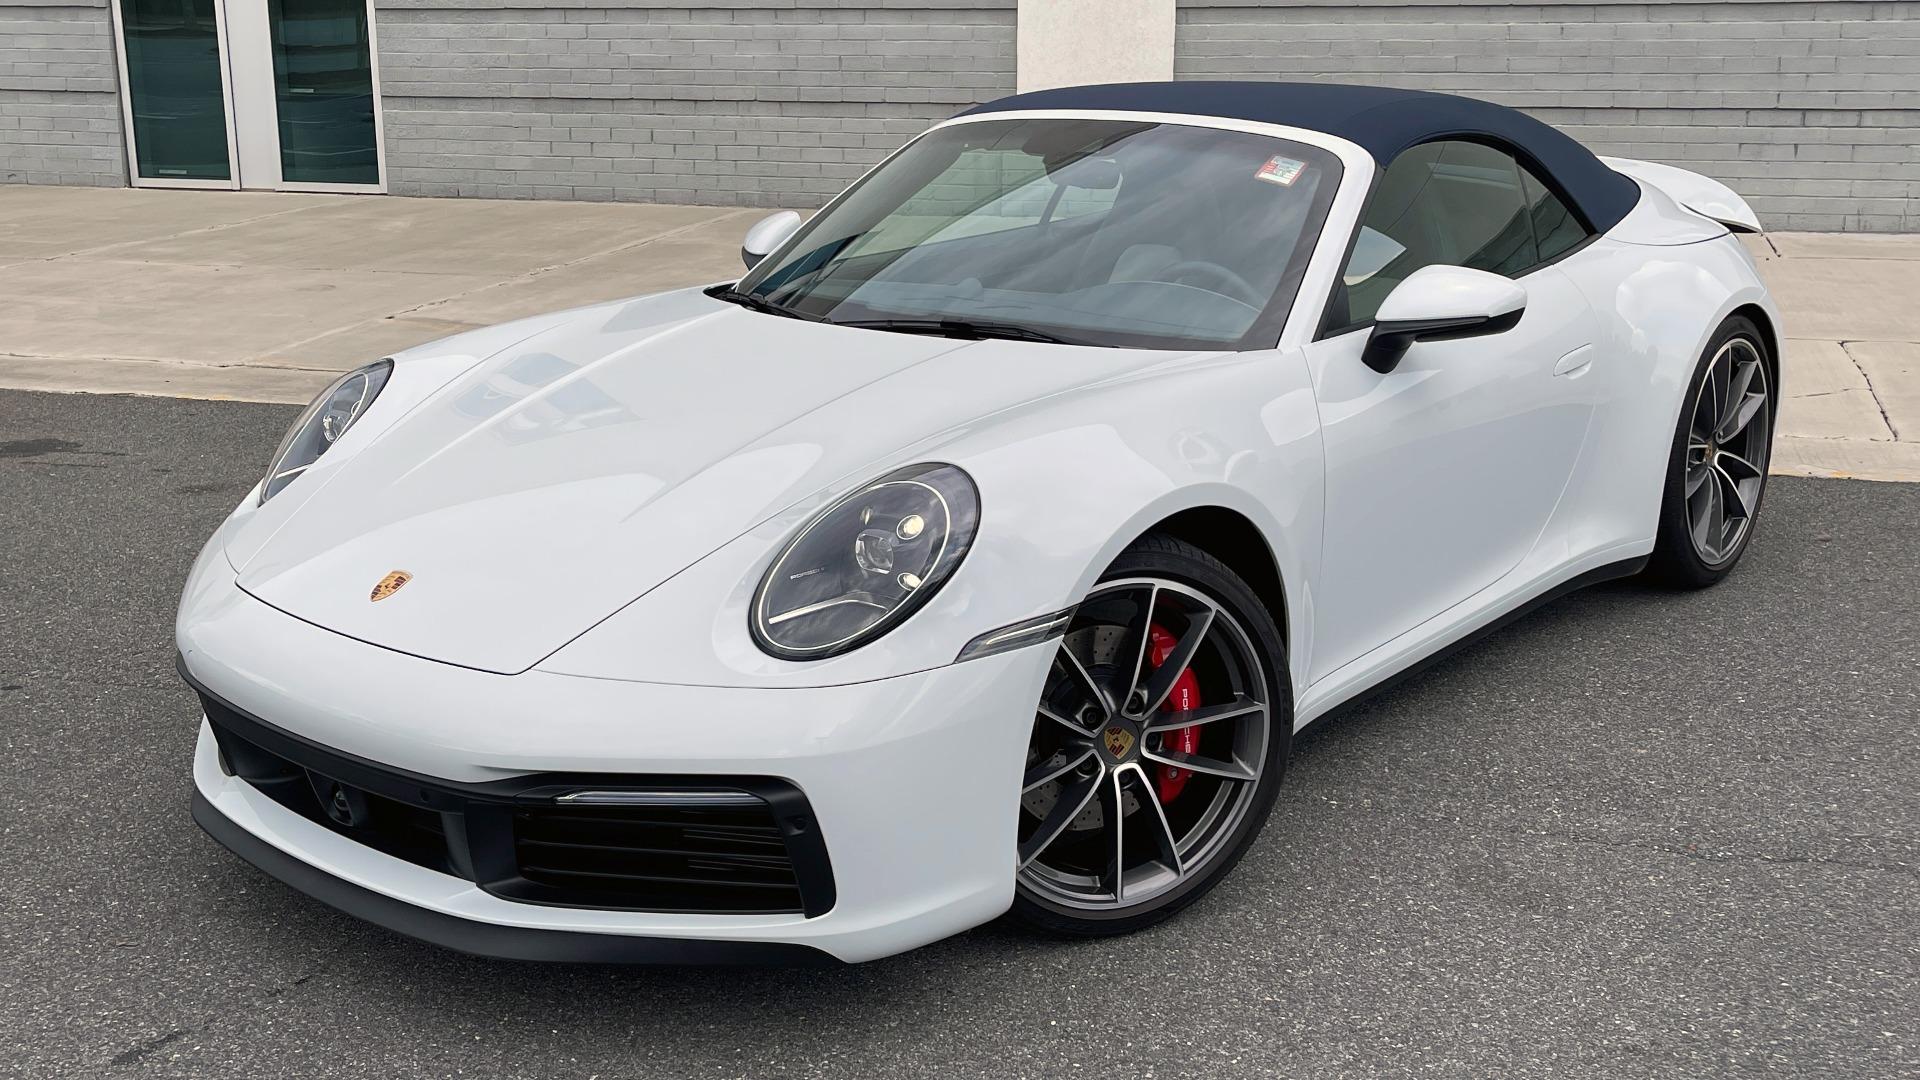 Used 2020 Porsche 911 CARRERA 4S CABRIOLET PREMIUM SPORT PKG / NAV / BOSE / LIGHT DESIGN PKG for sale $167,595 at Formula Imports in Charlotte NC 28227 6